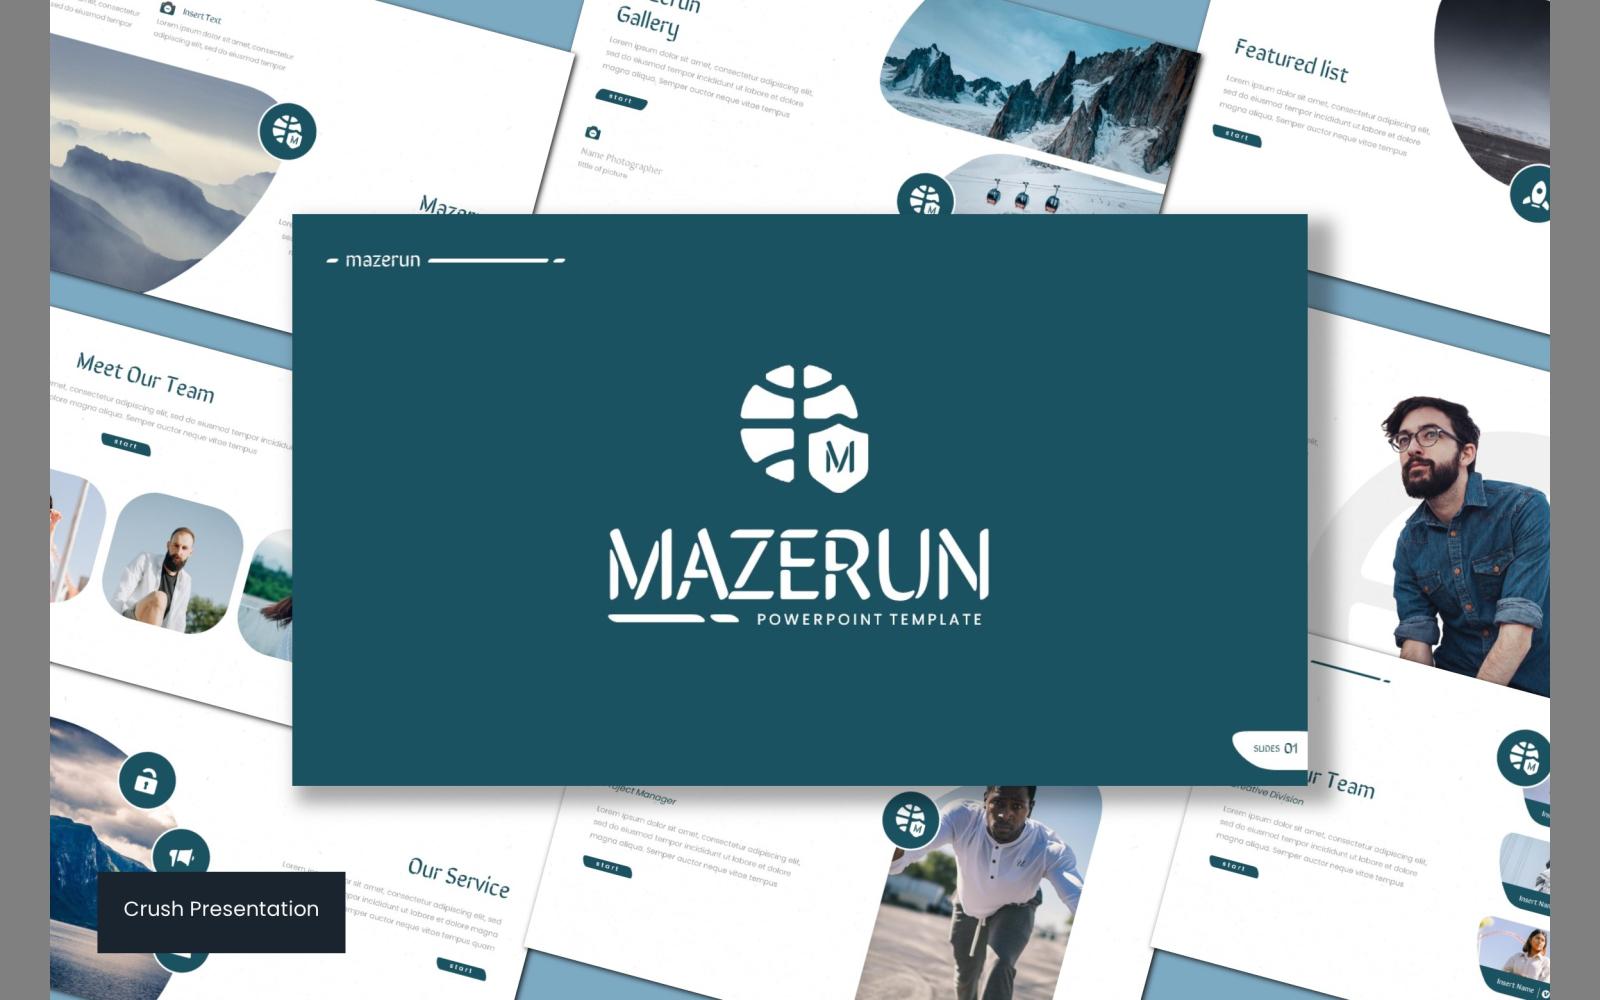 Mazerun PowerPoint Template